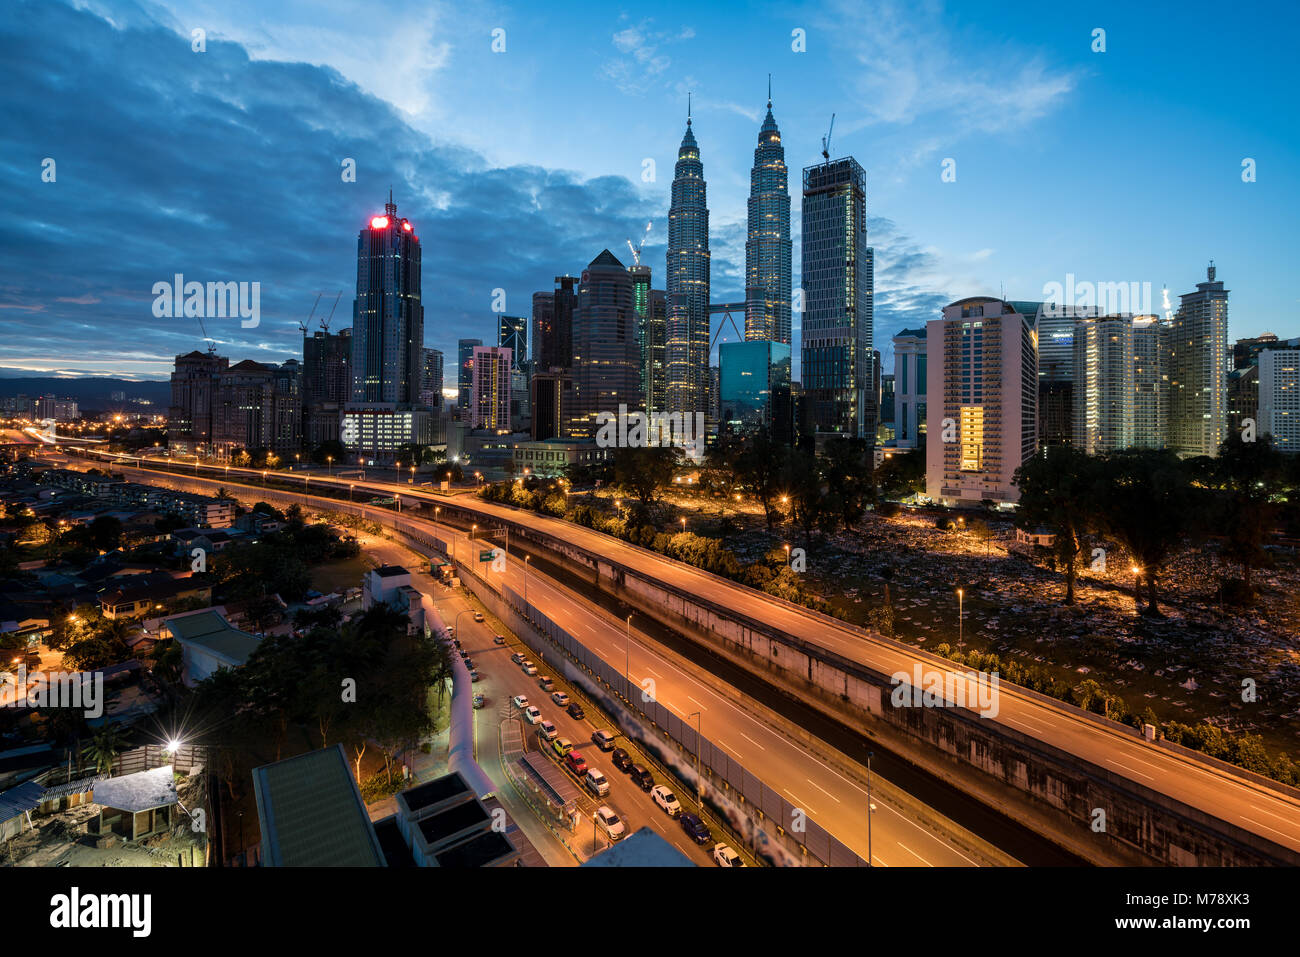 Kuala Lumpur skyline e grattacielo con autostrada strada notturna di Kuala Lumpur in Malesia. Asia. Immagini Stock